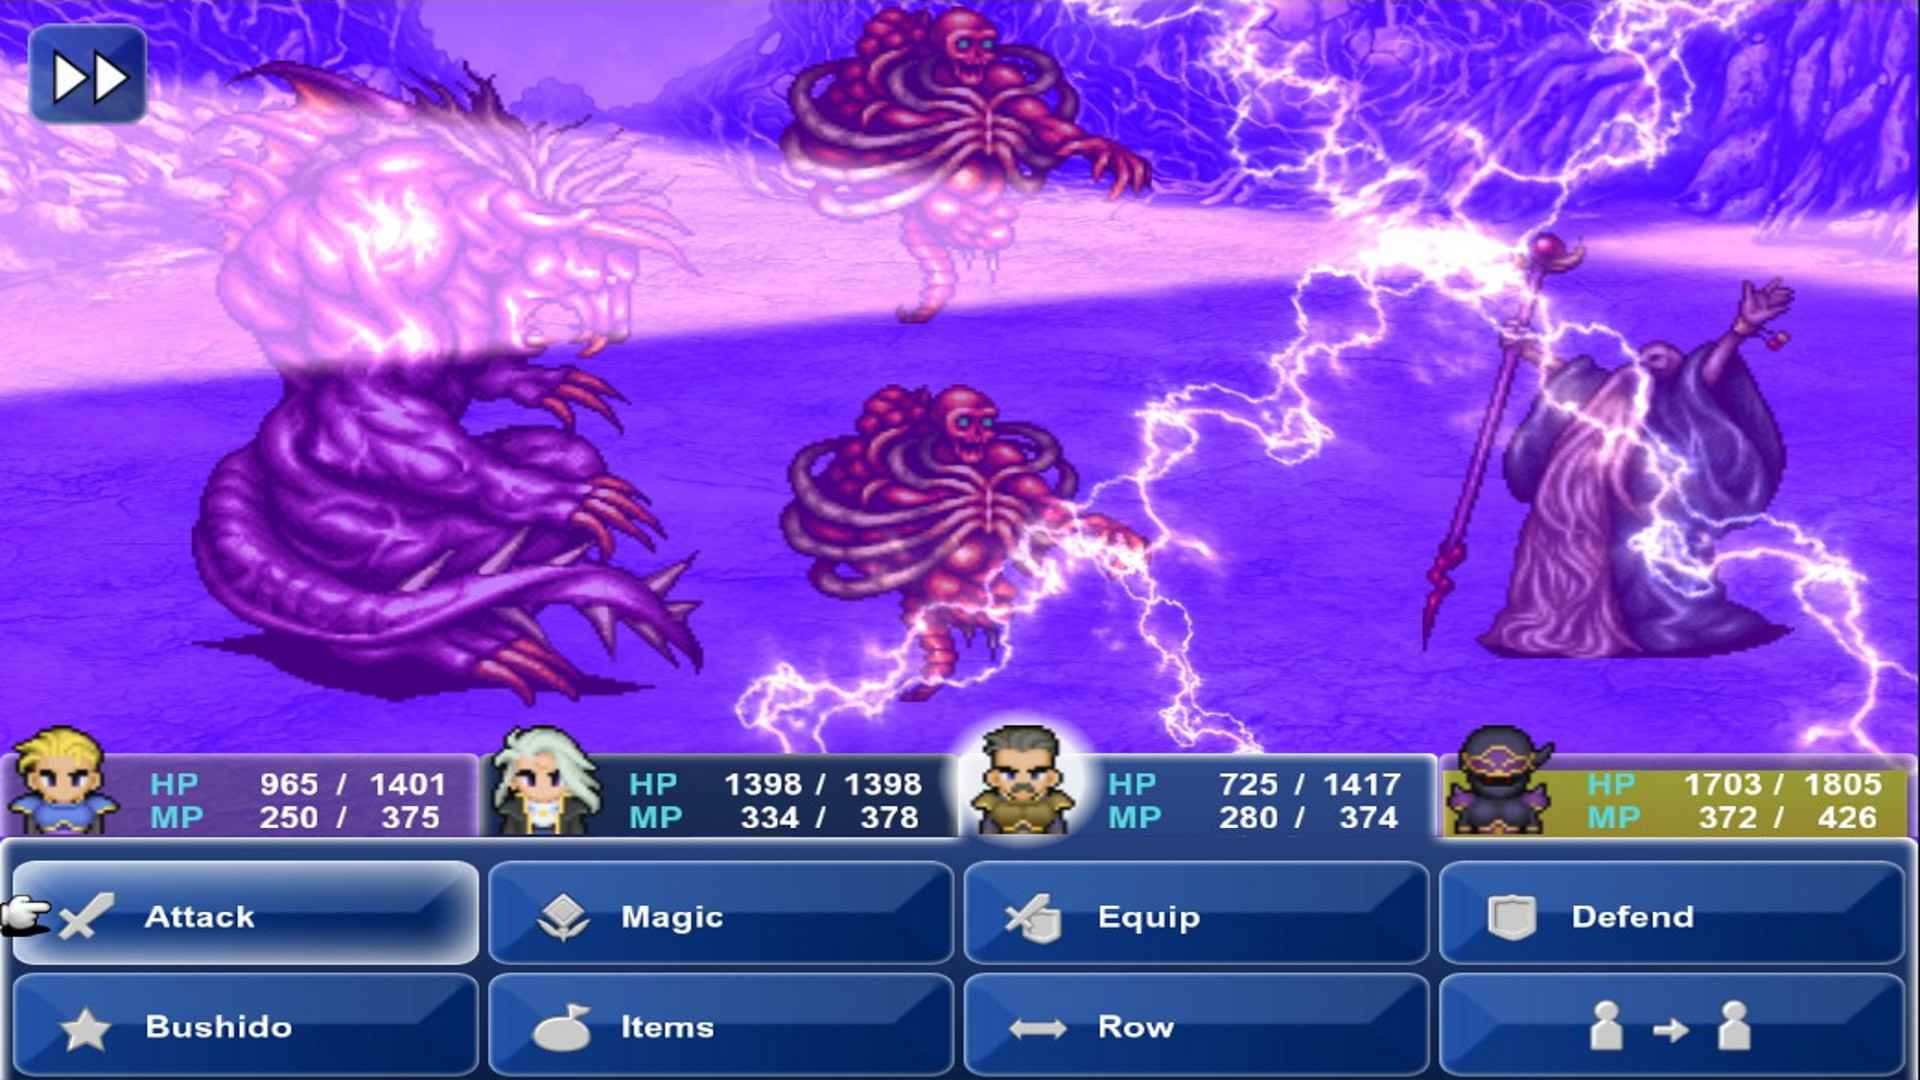 Screenshot from Final Fantasy VI